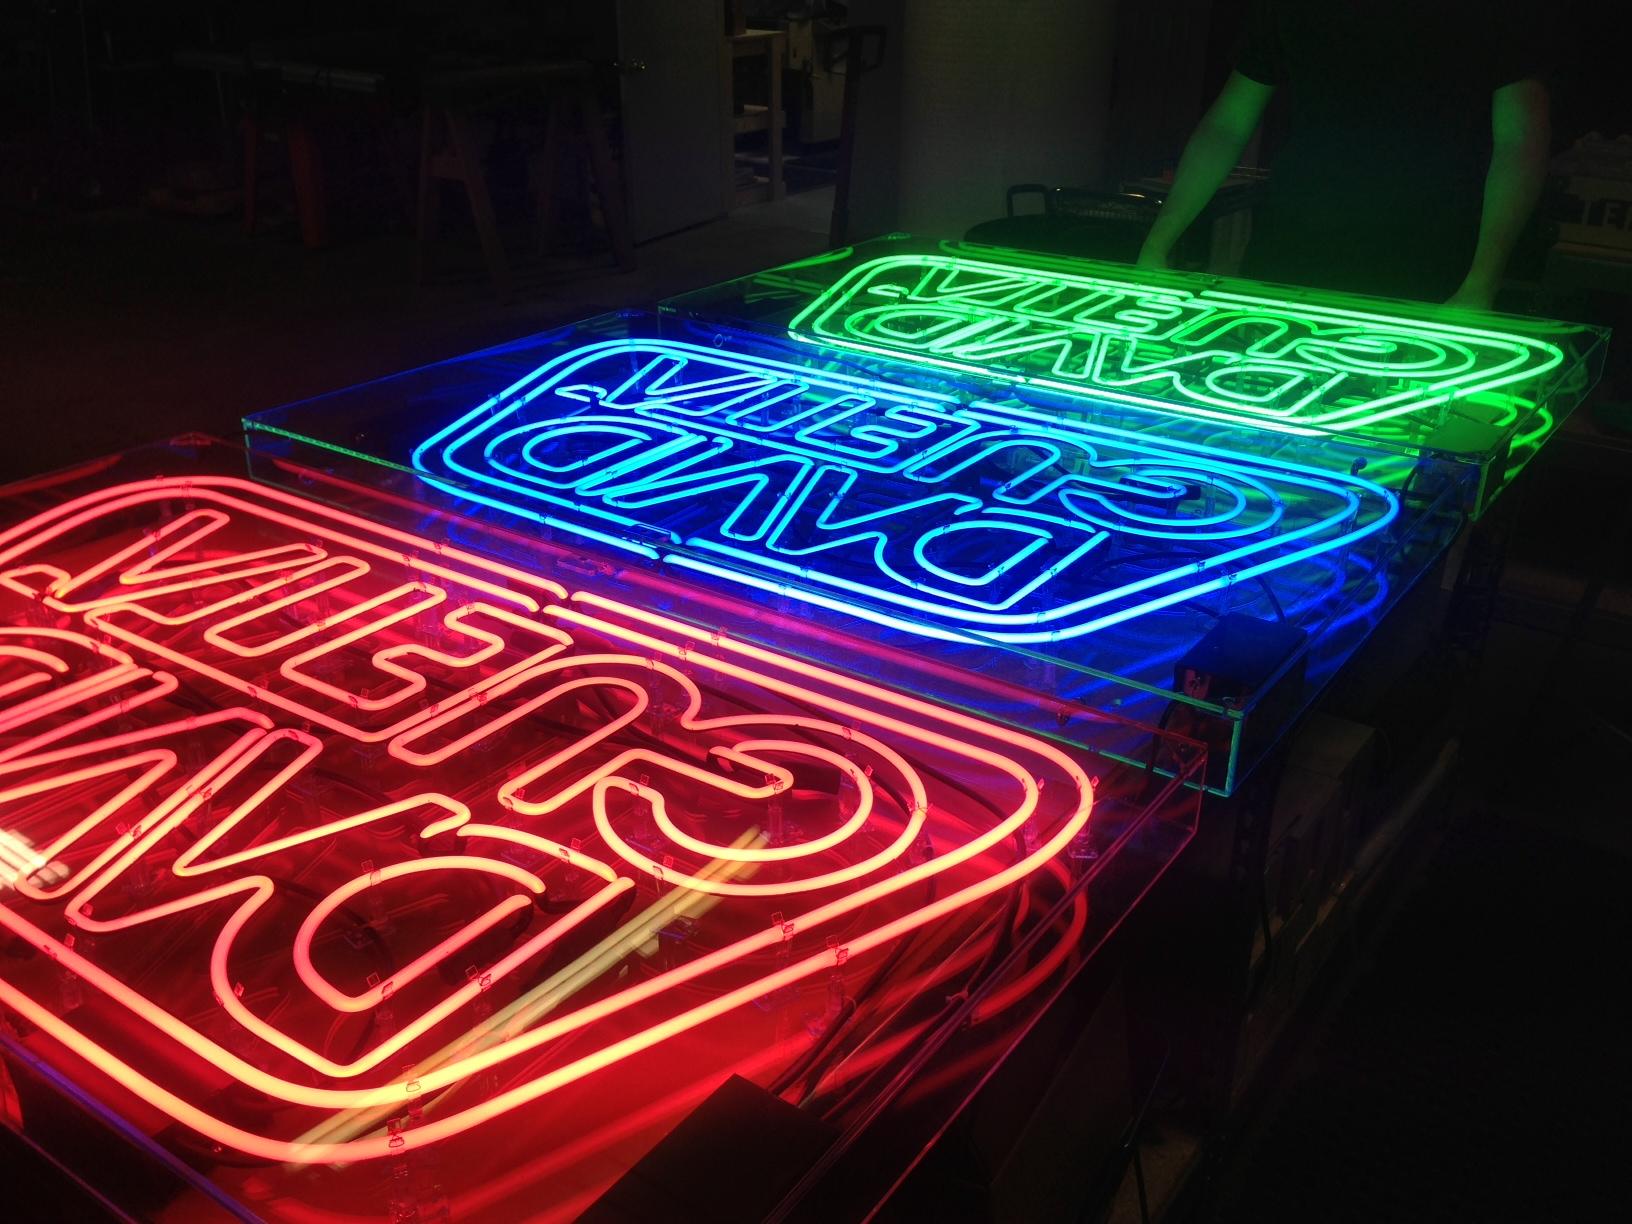 neon-sign1.jpeg